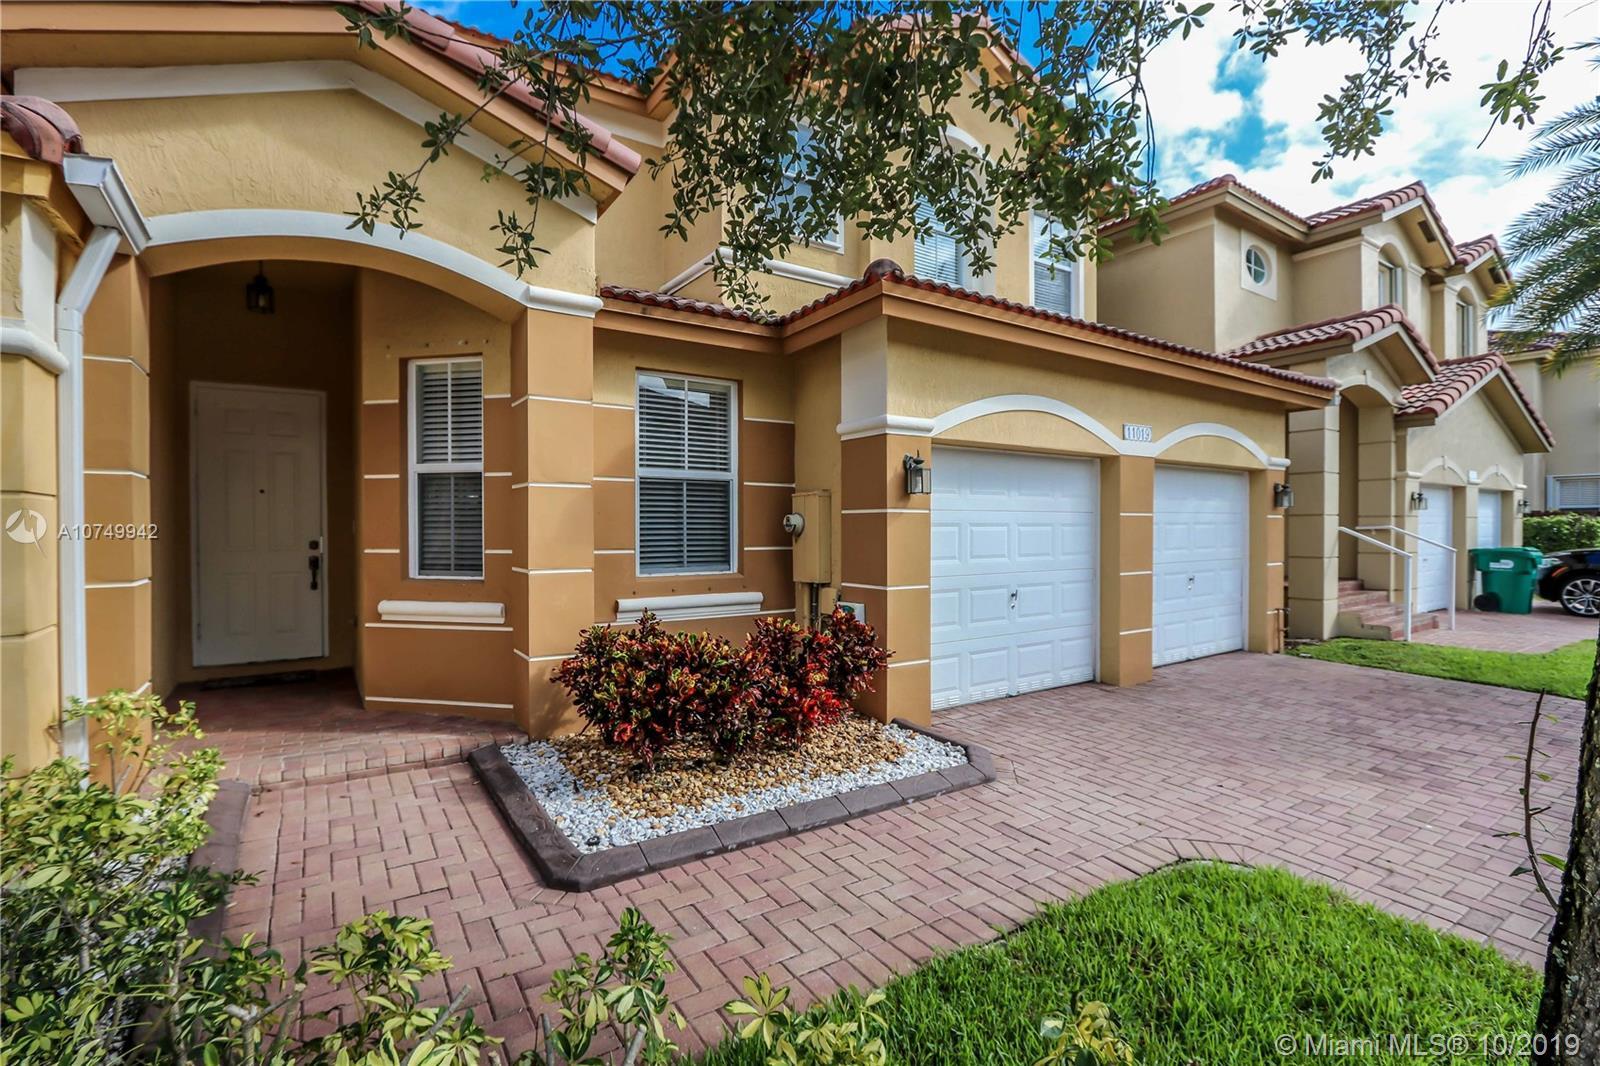 11019 NW 86th TERR, Doral, FL 33178 - Doral, FL real estate listing